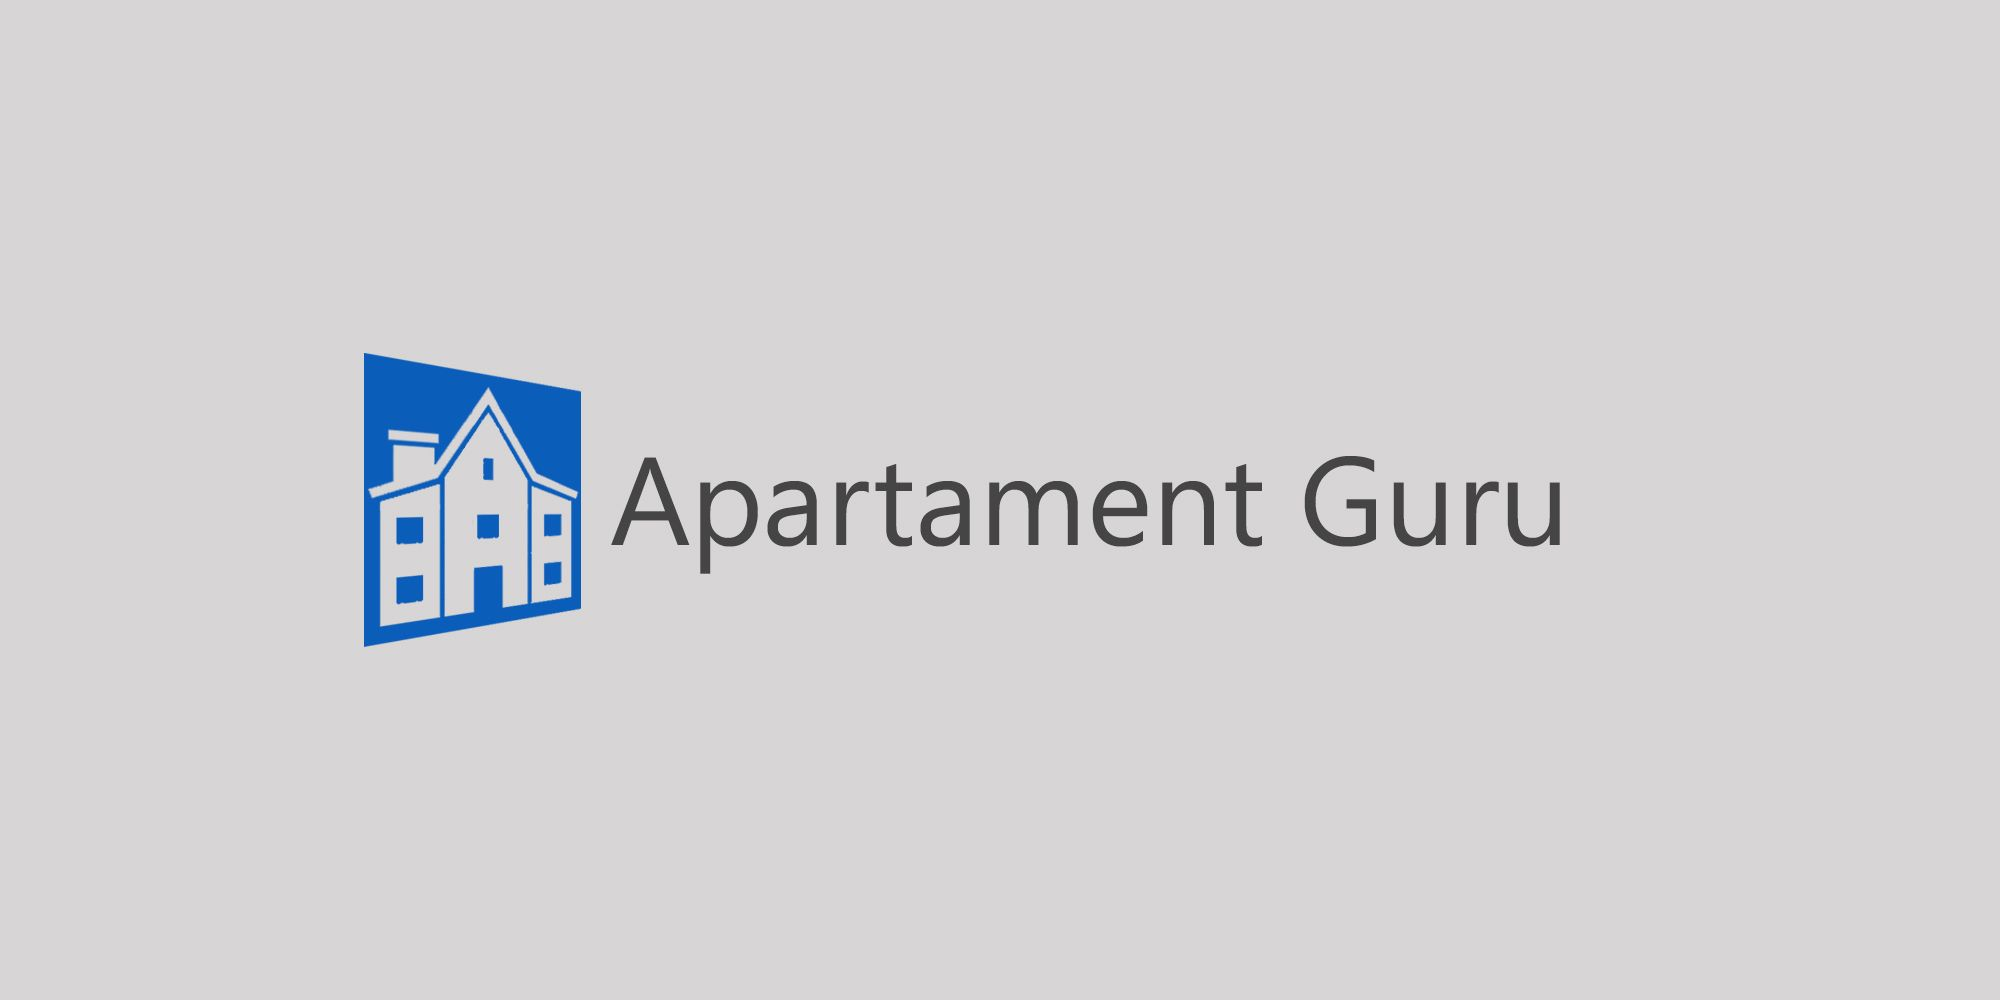 Дизайн логотипа сайта apartment guru - дизайнер fixsed